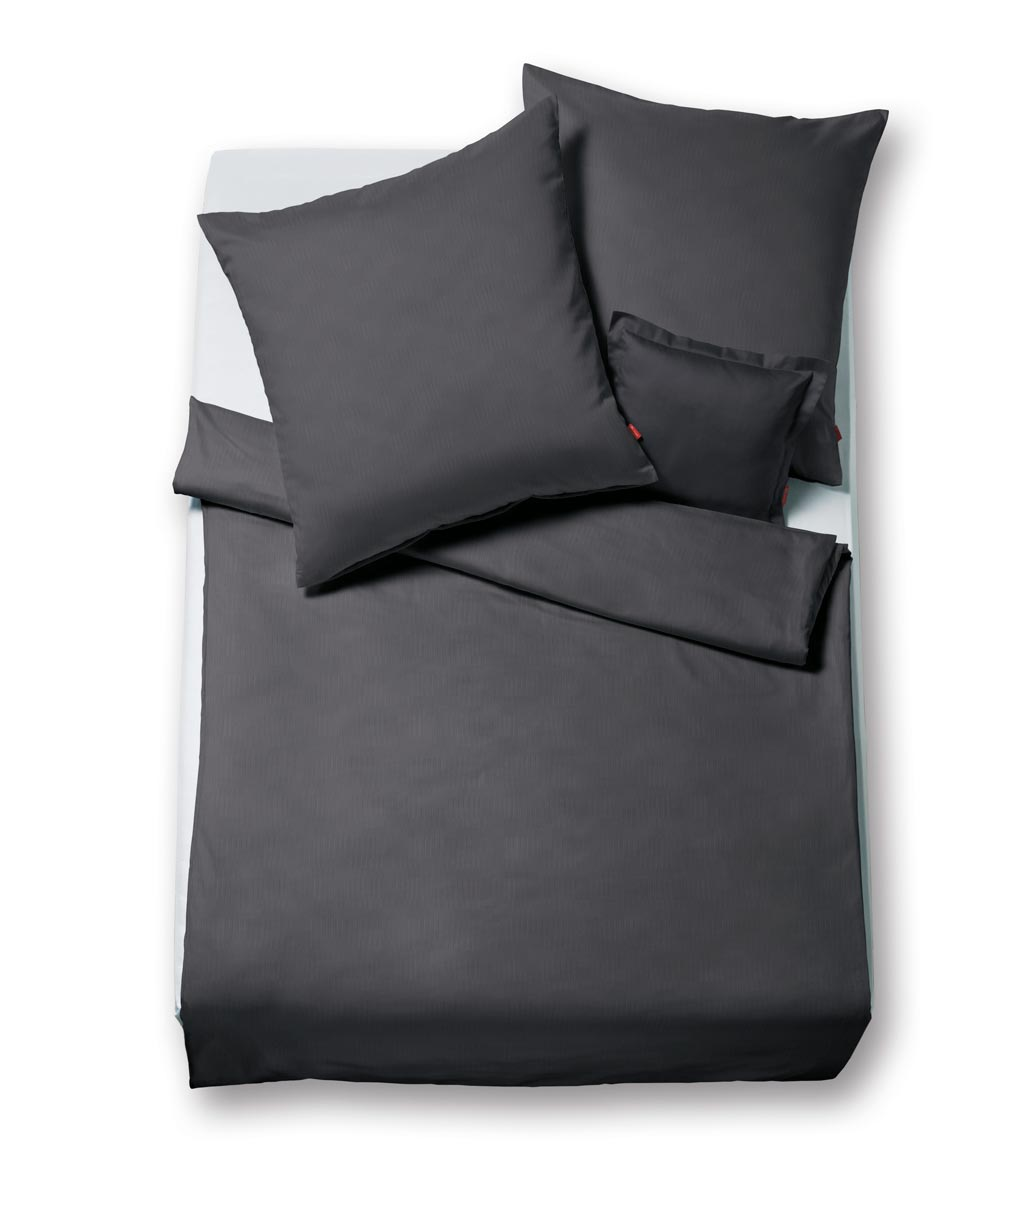 flanell bettw sche von fleuresse lech anthrazit dunkelgrau xxl gr e 240x220 240x220 2x 80x80. Black Bedroom Furniture Sets. Home Design Ideas